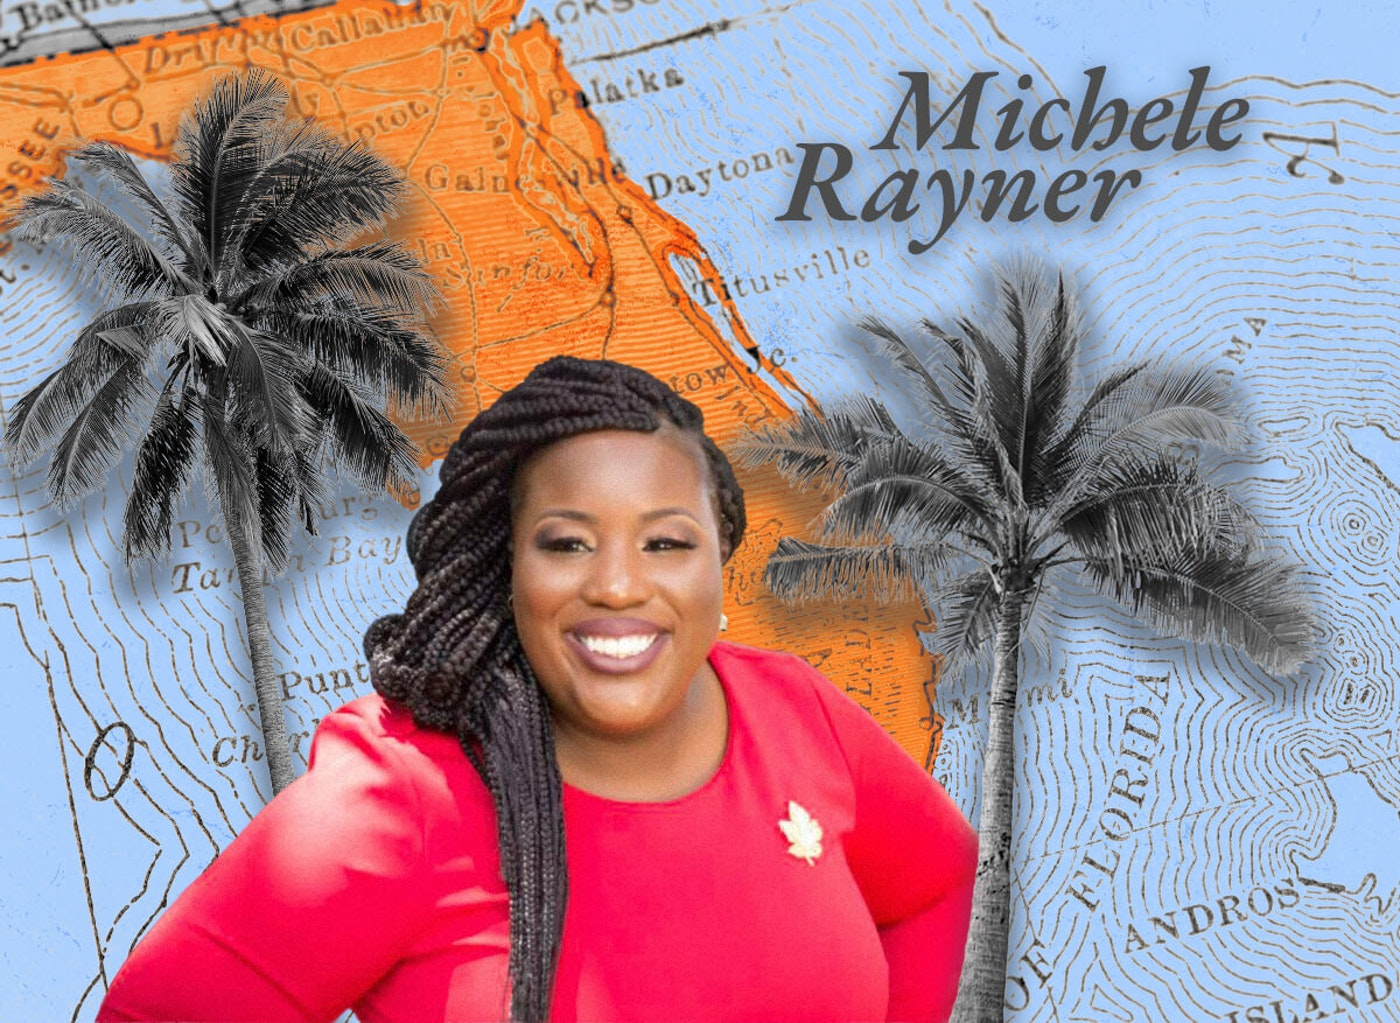 Michele-Rayner